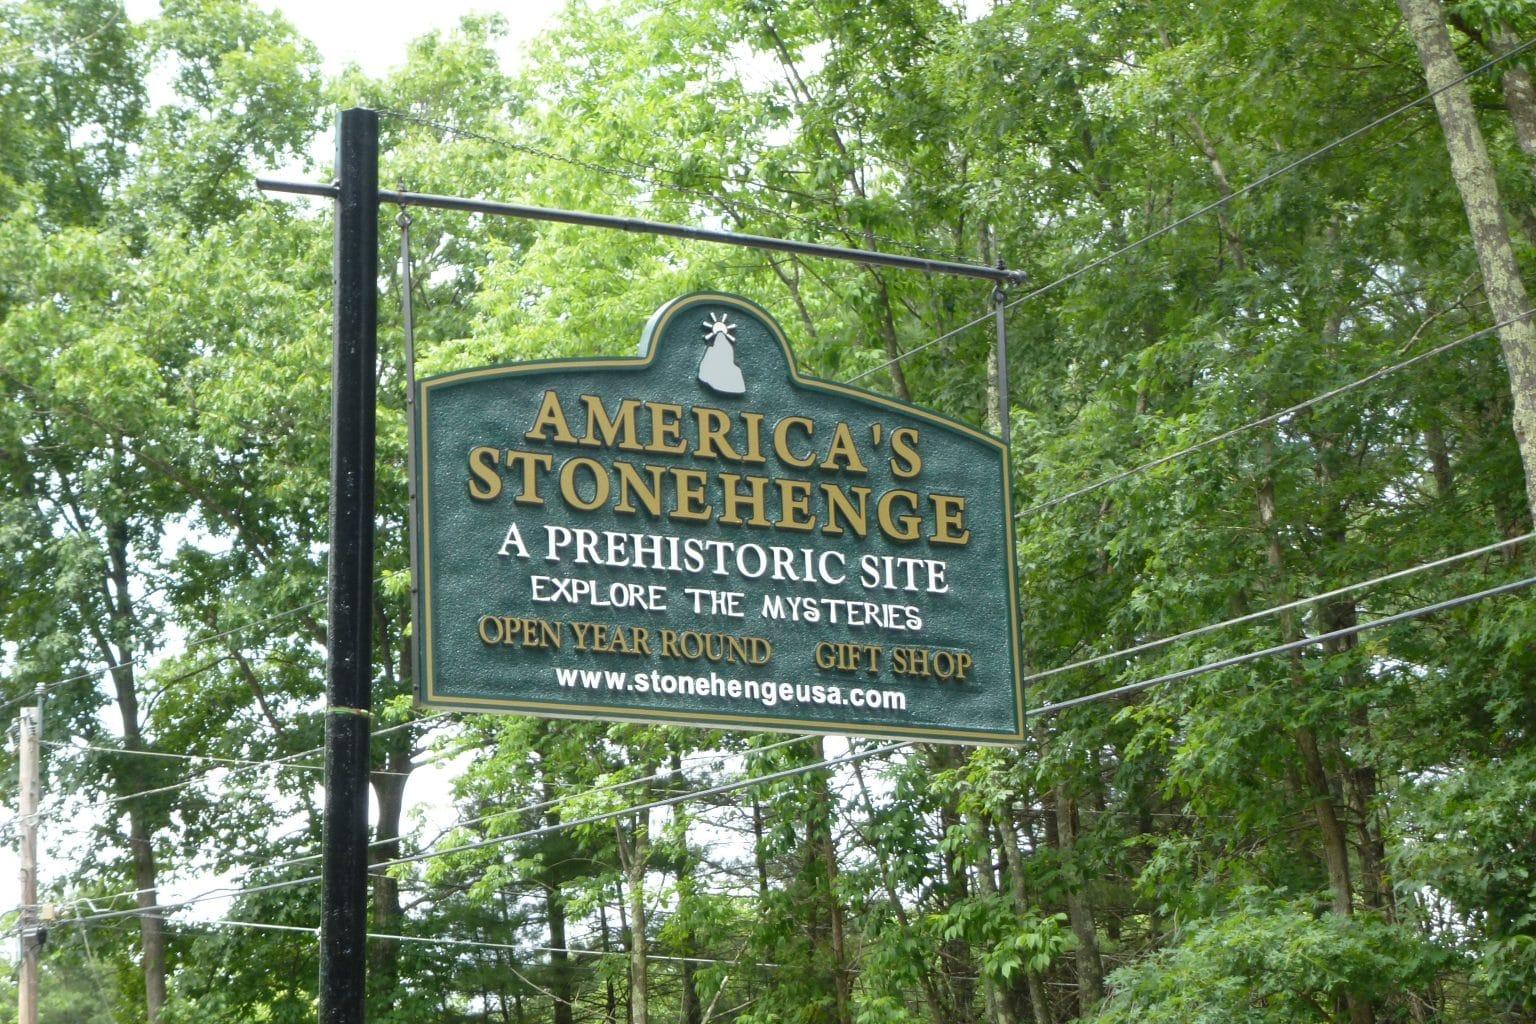 visit the Stonehenge in America